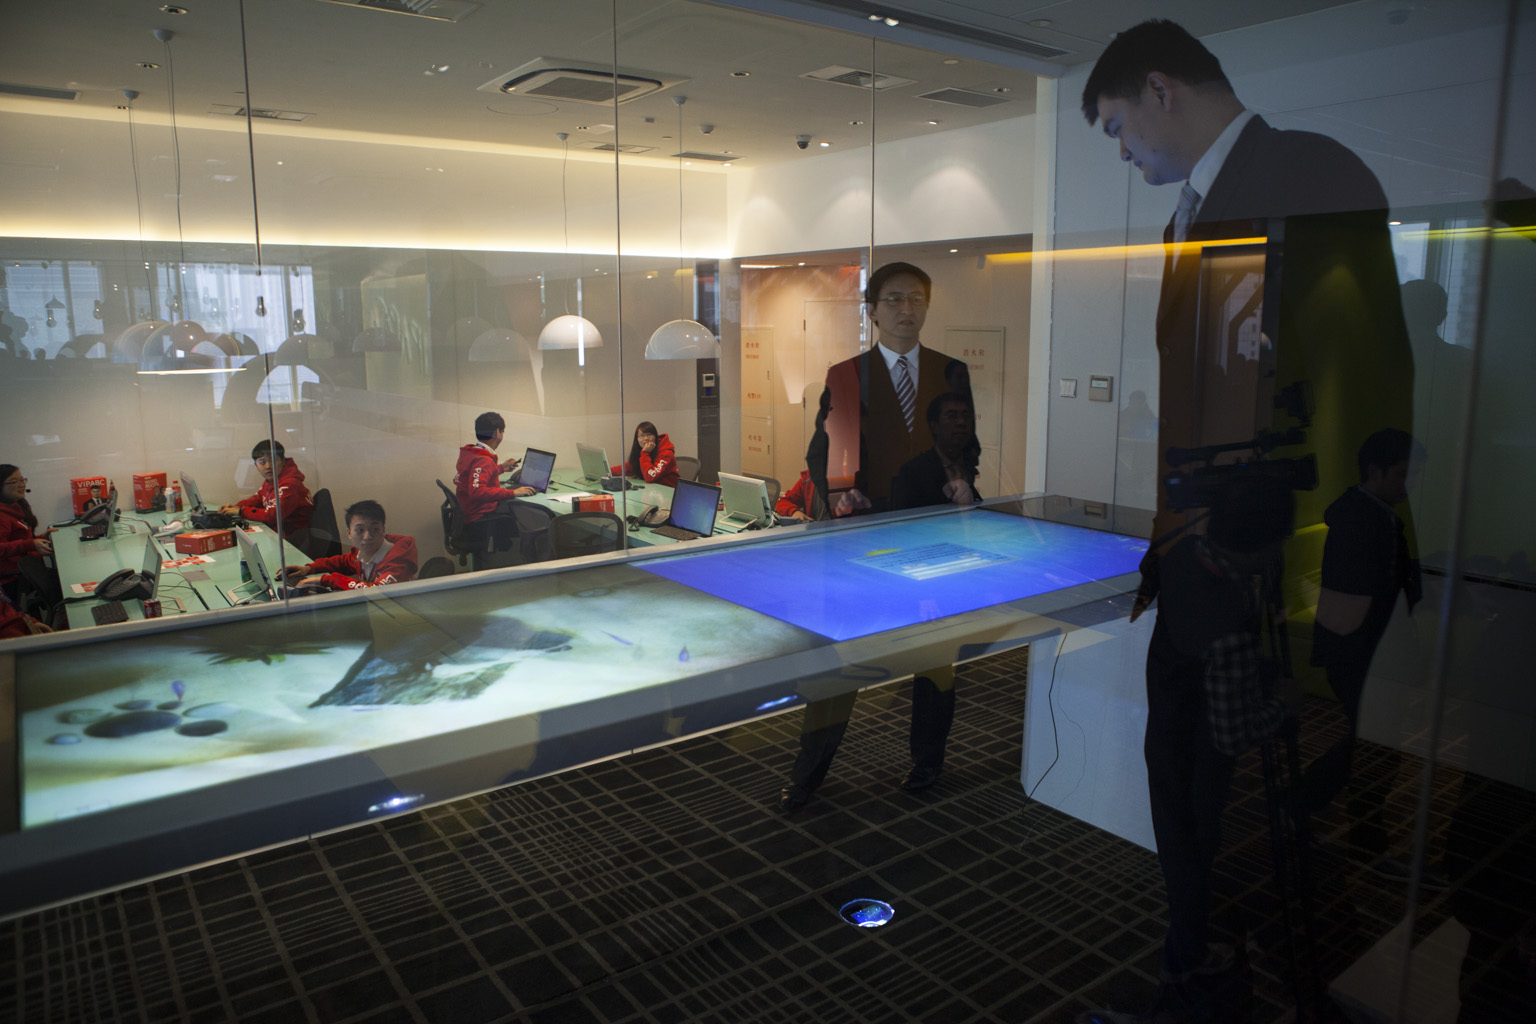 TutorGroup 榮獲2014中國年度城市最佳雇主China Best Employer Award-TutorABC延攬台灣高科技專業人才 進軍國際(4)